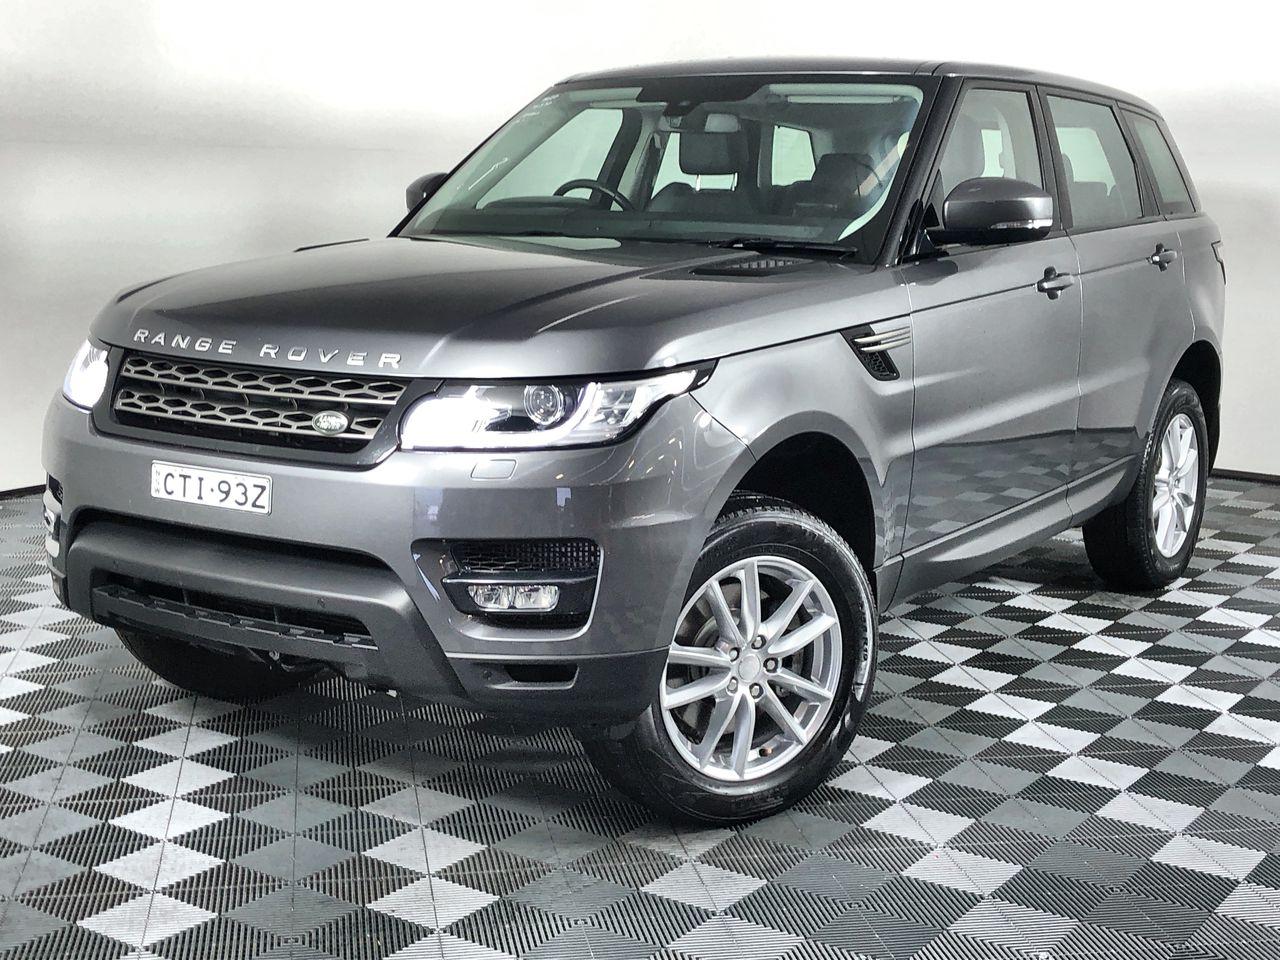 2014 Land Rover Range Rover Sport 3.0 TDV6 SE L494 T/Diesel Auto- 8 Speed